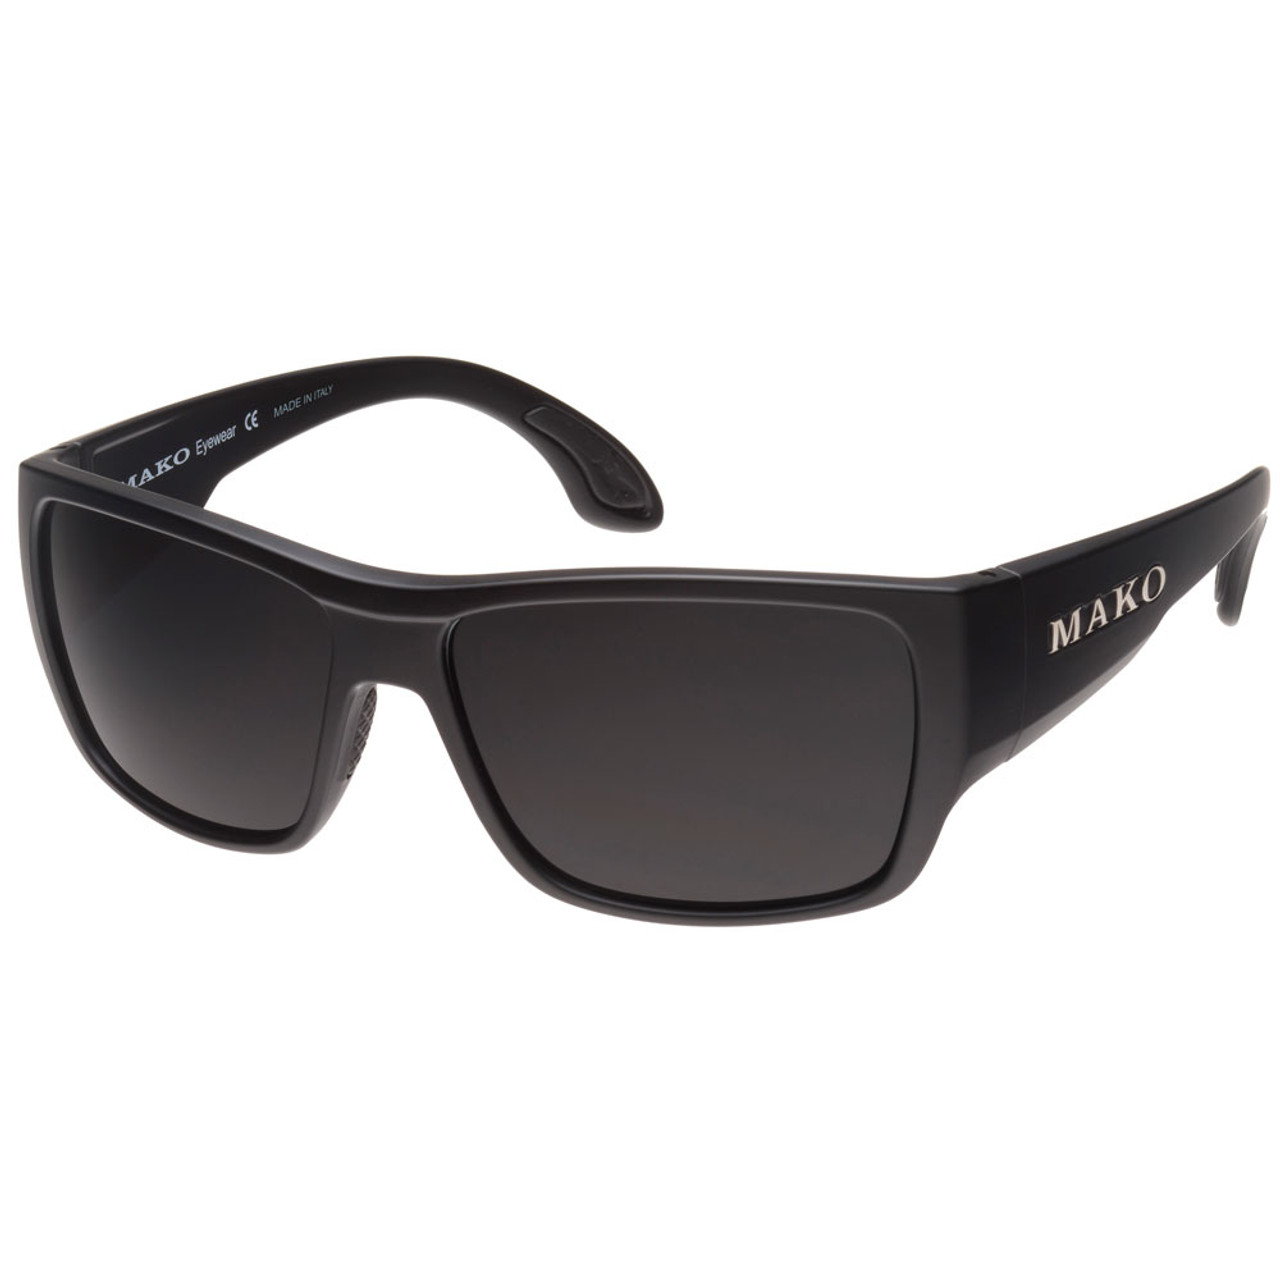 d53a05a7fa Mako Covert Sunglasses Polarised Popular Model